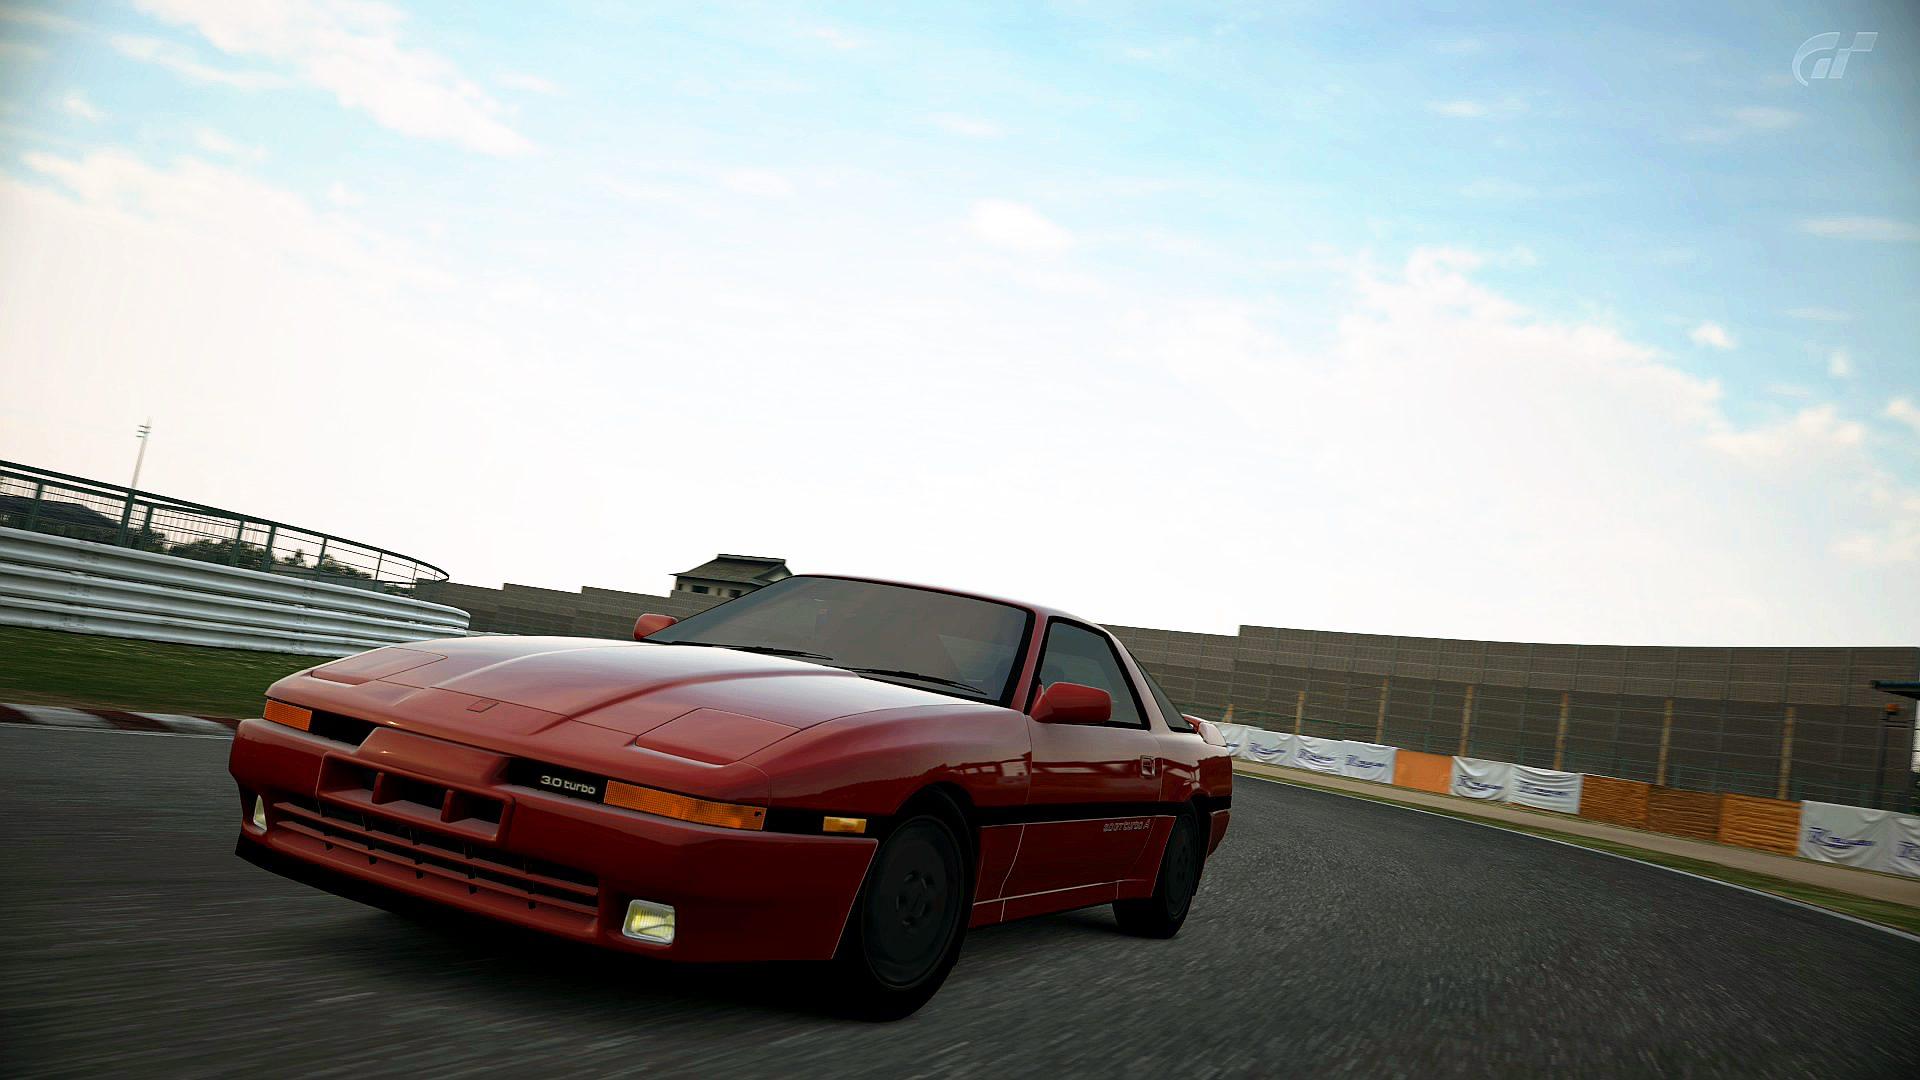 Supra Turbo on Tsukuba_2.jpg